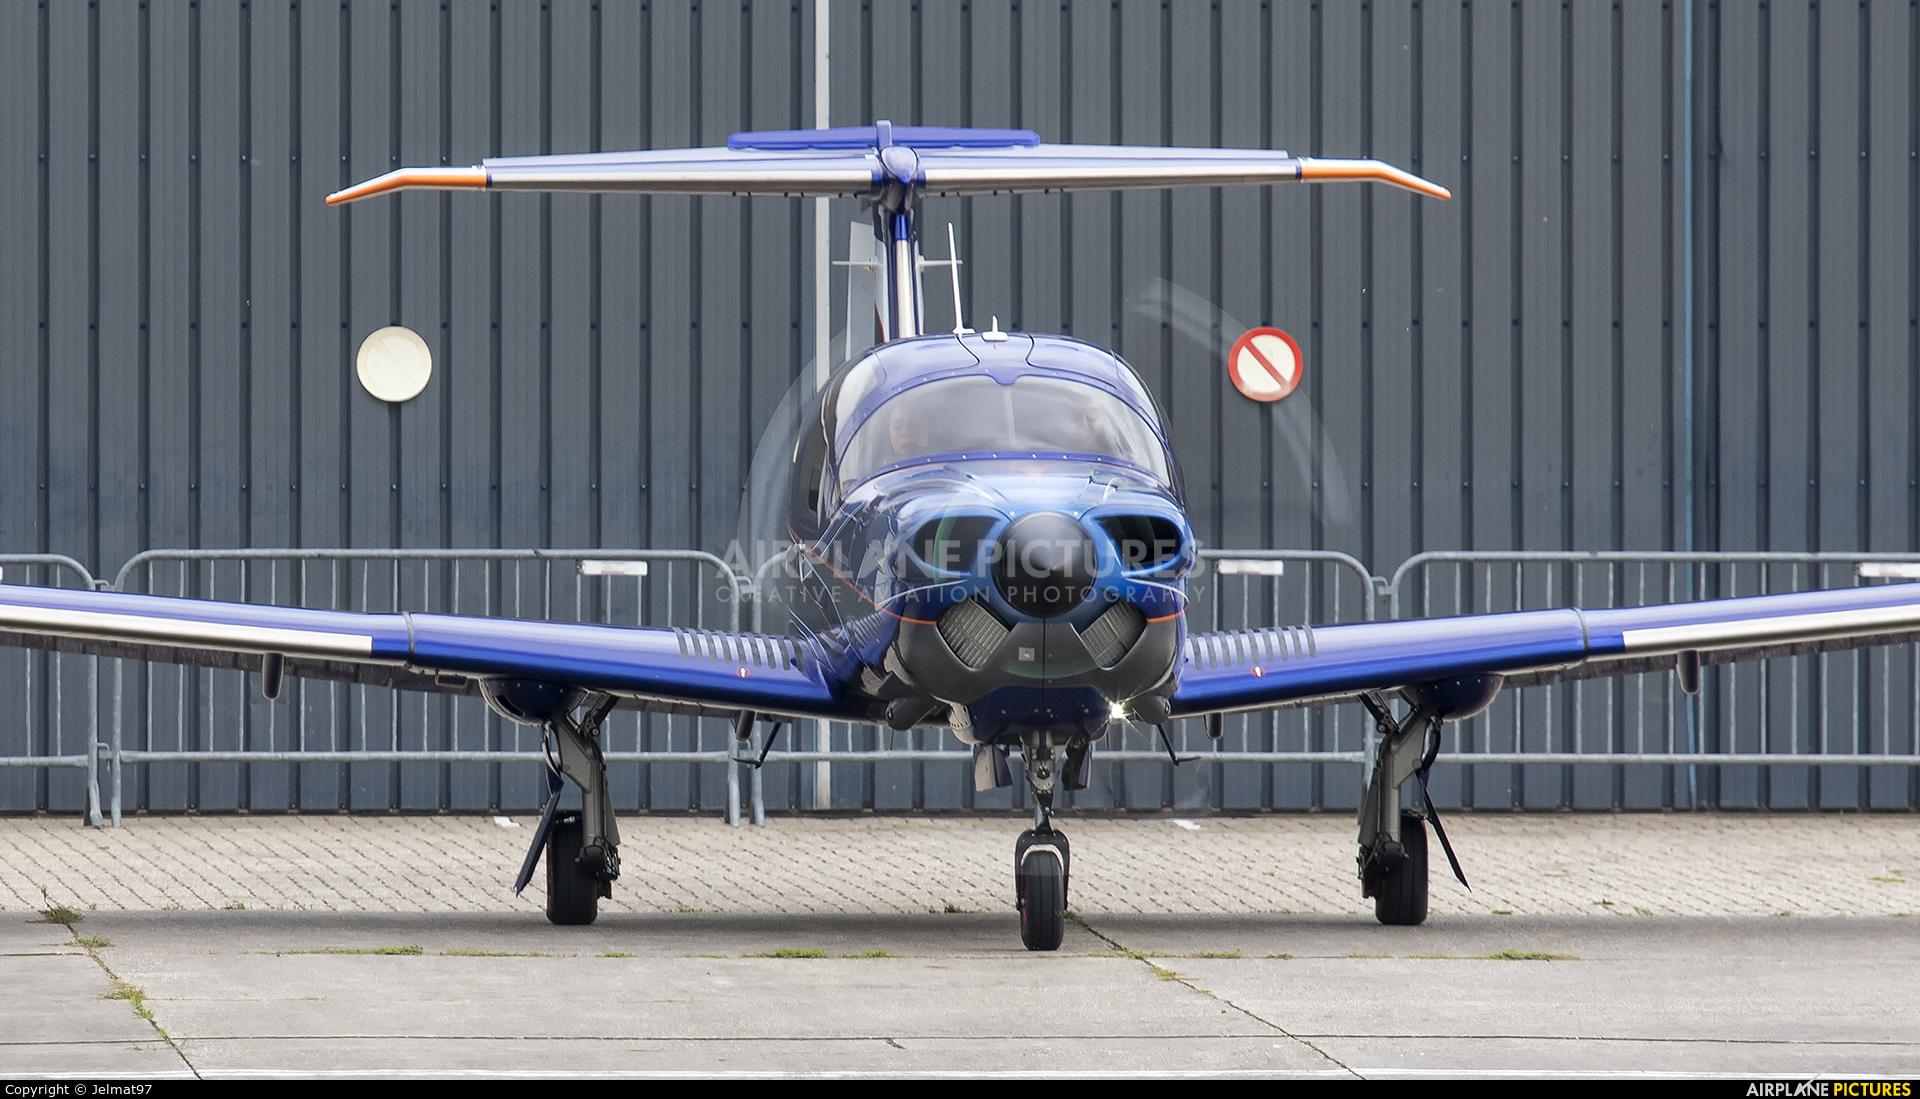 Diamond Aircraft Industries OE-VTW aircraft at Lelystad